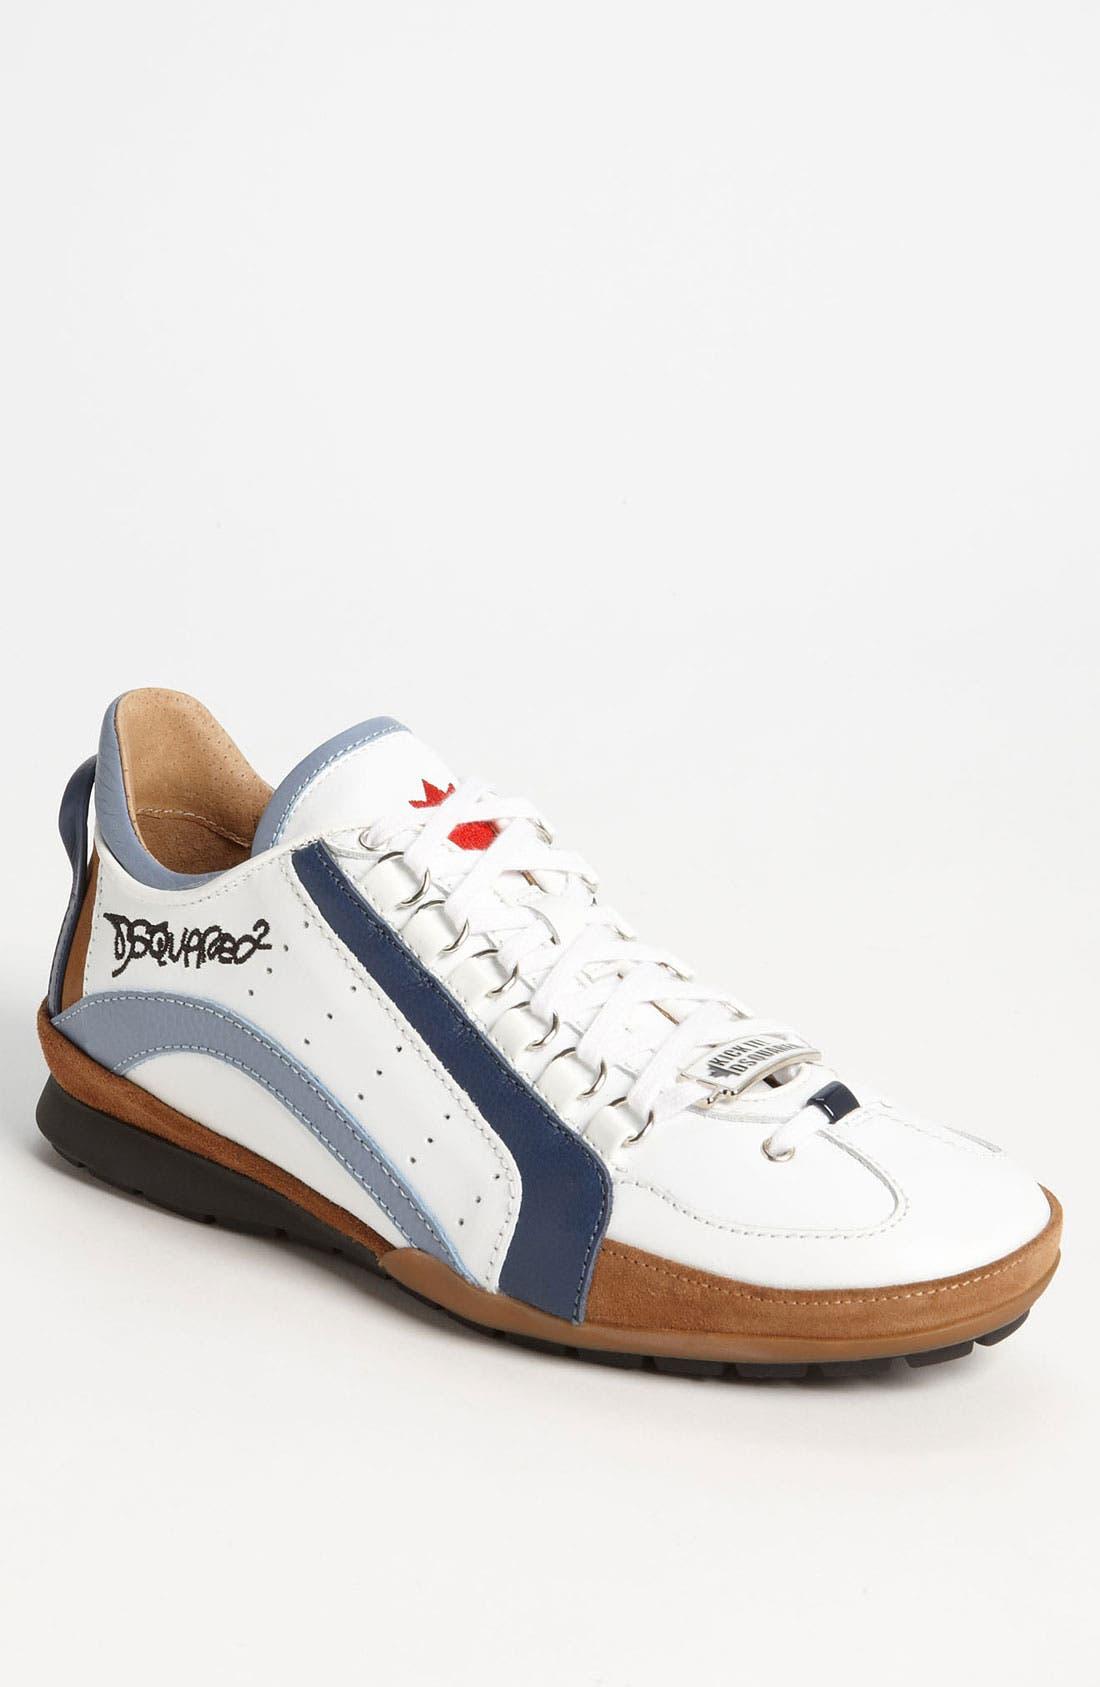 Main Image - Dsquared2 '551 Sport' Sneaker